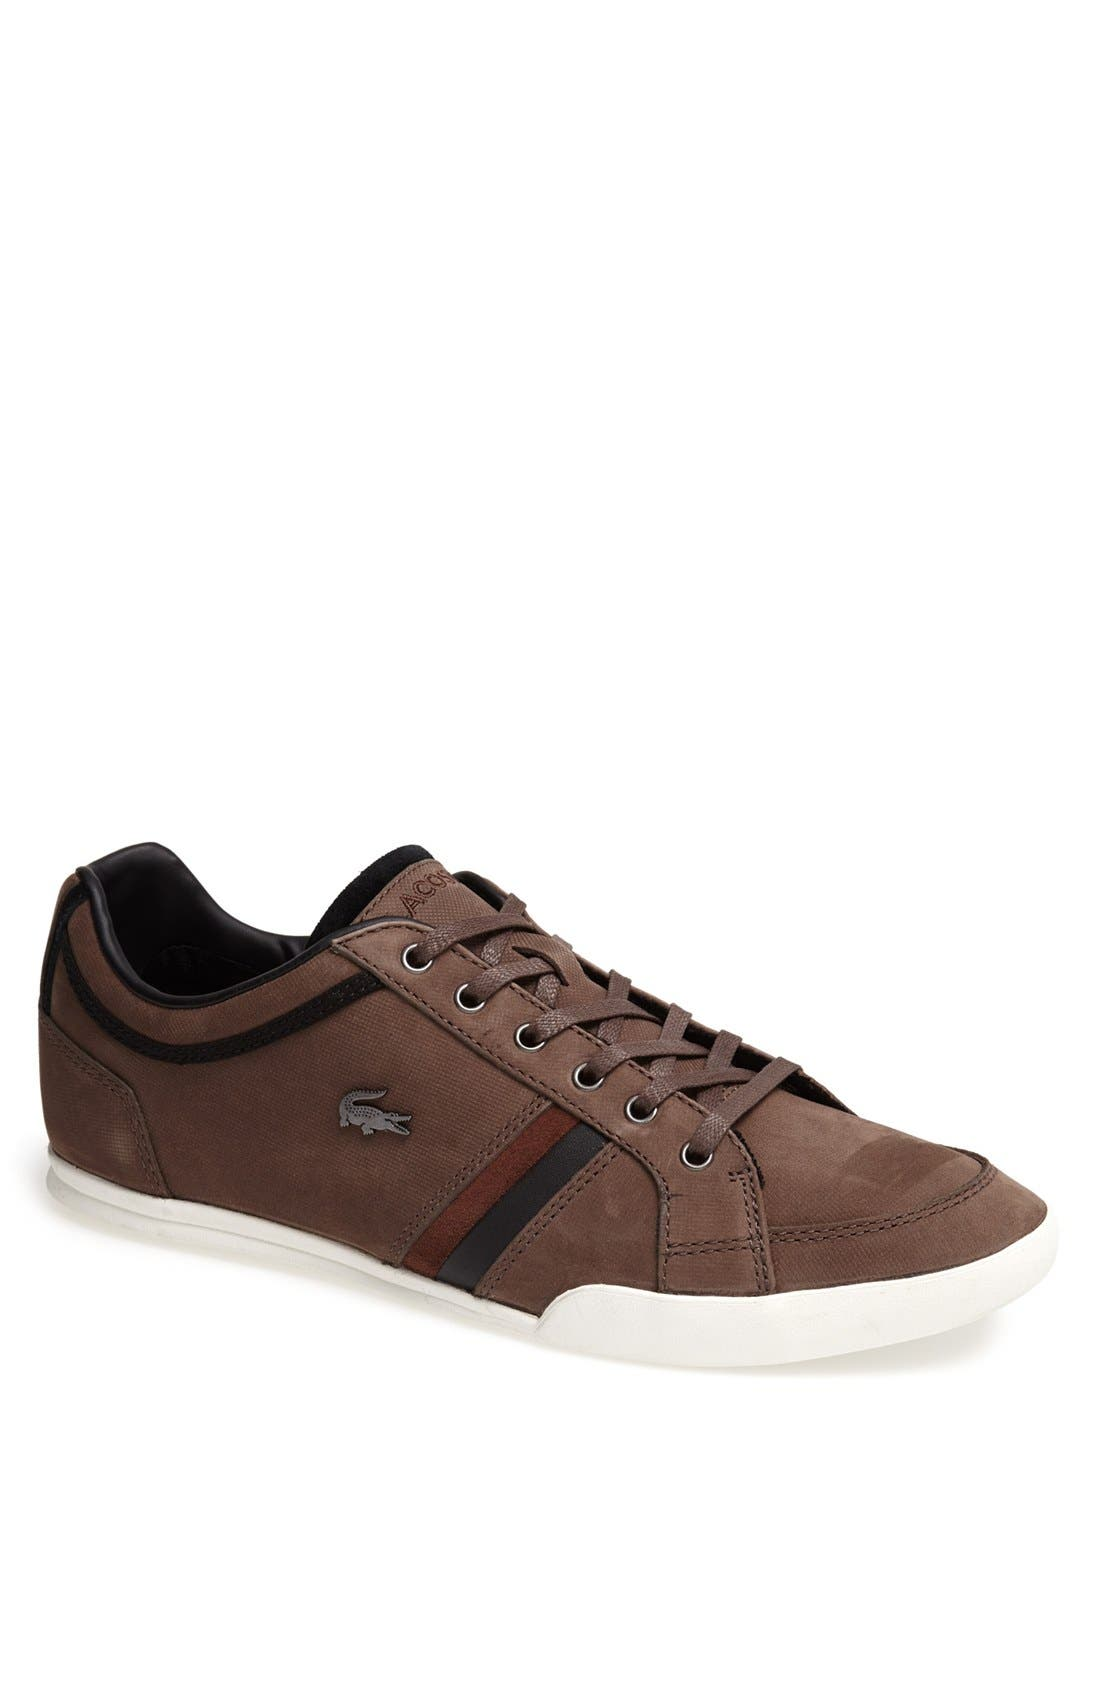 Main Image - Lacoste 'Rayford 4' Sneaker (Men)